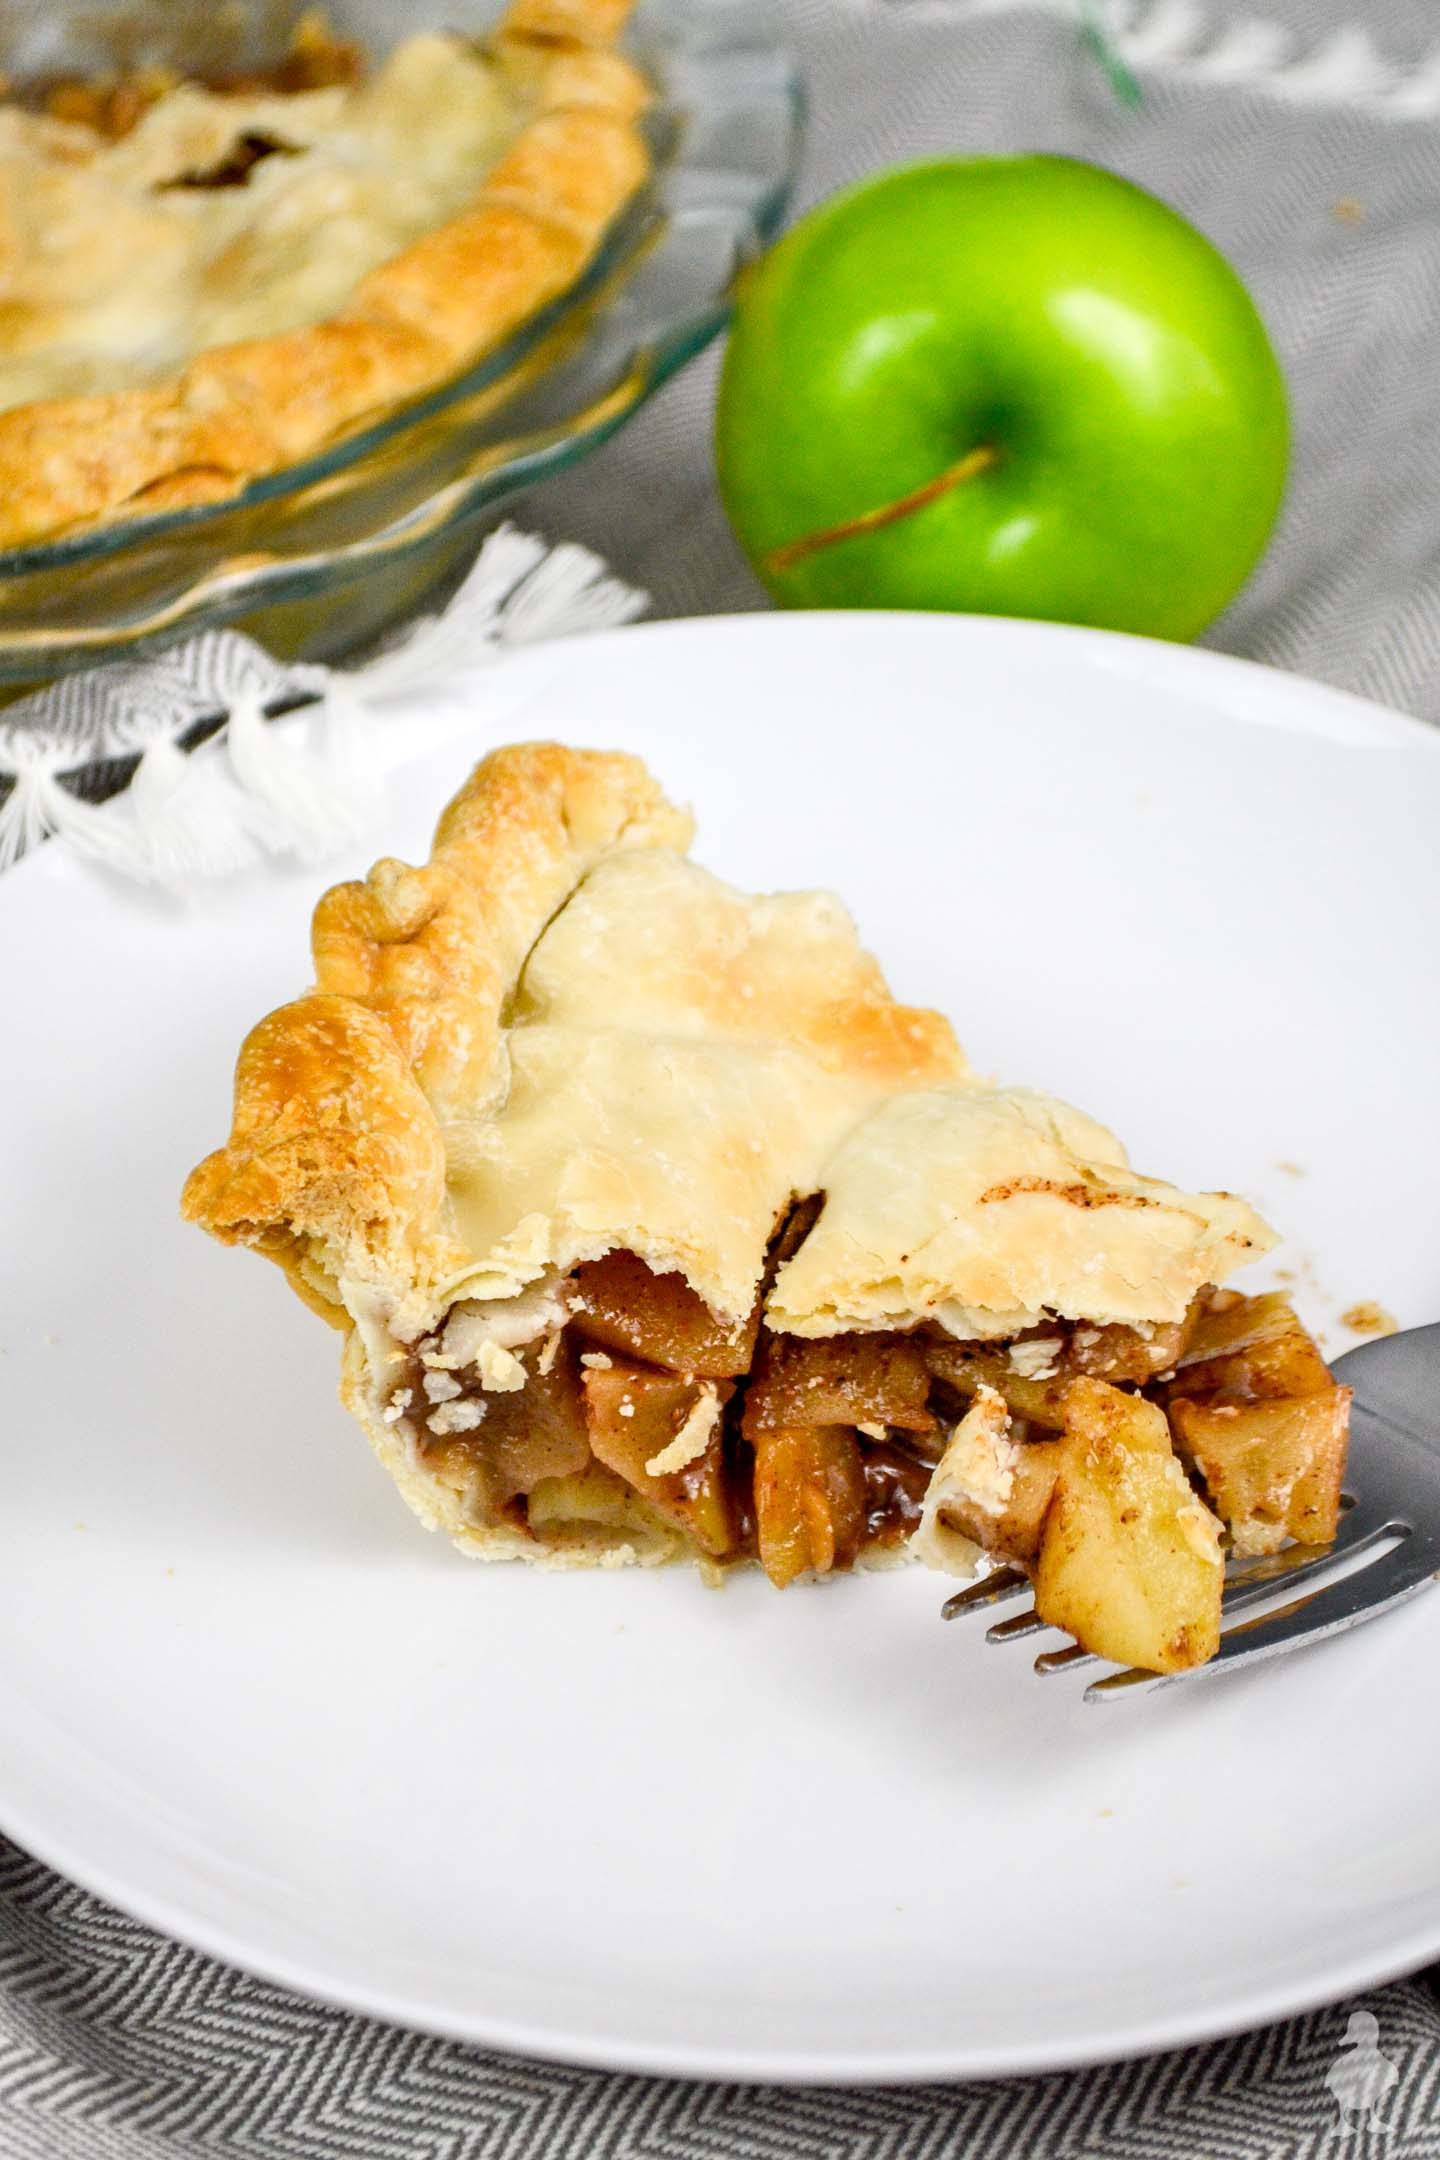 My family recipe rocks apple pie Classic Brandy Apple Pie Ugly Duckling House